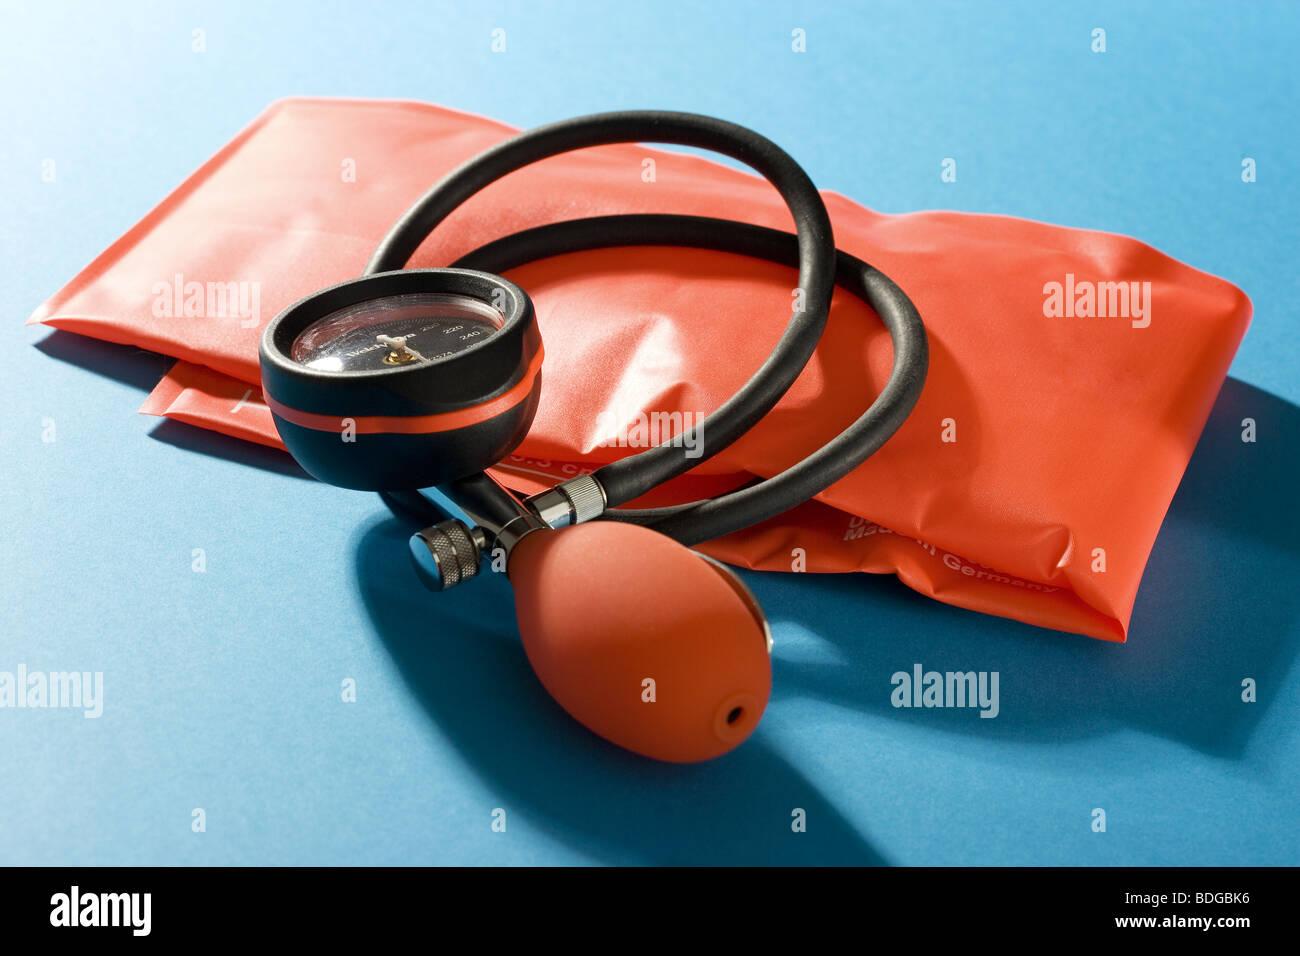 BLOOD PRESSURE EQUIPMENT - Stock Image